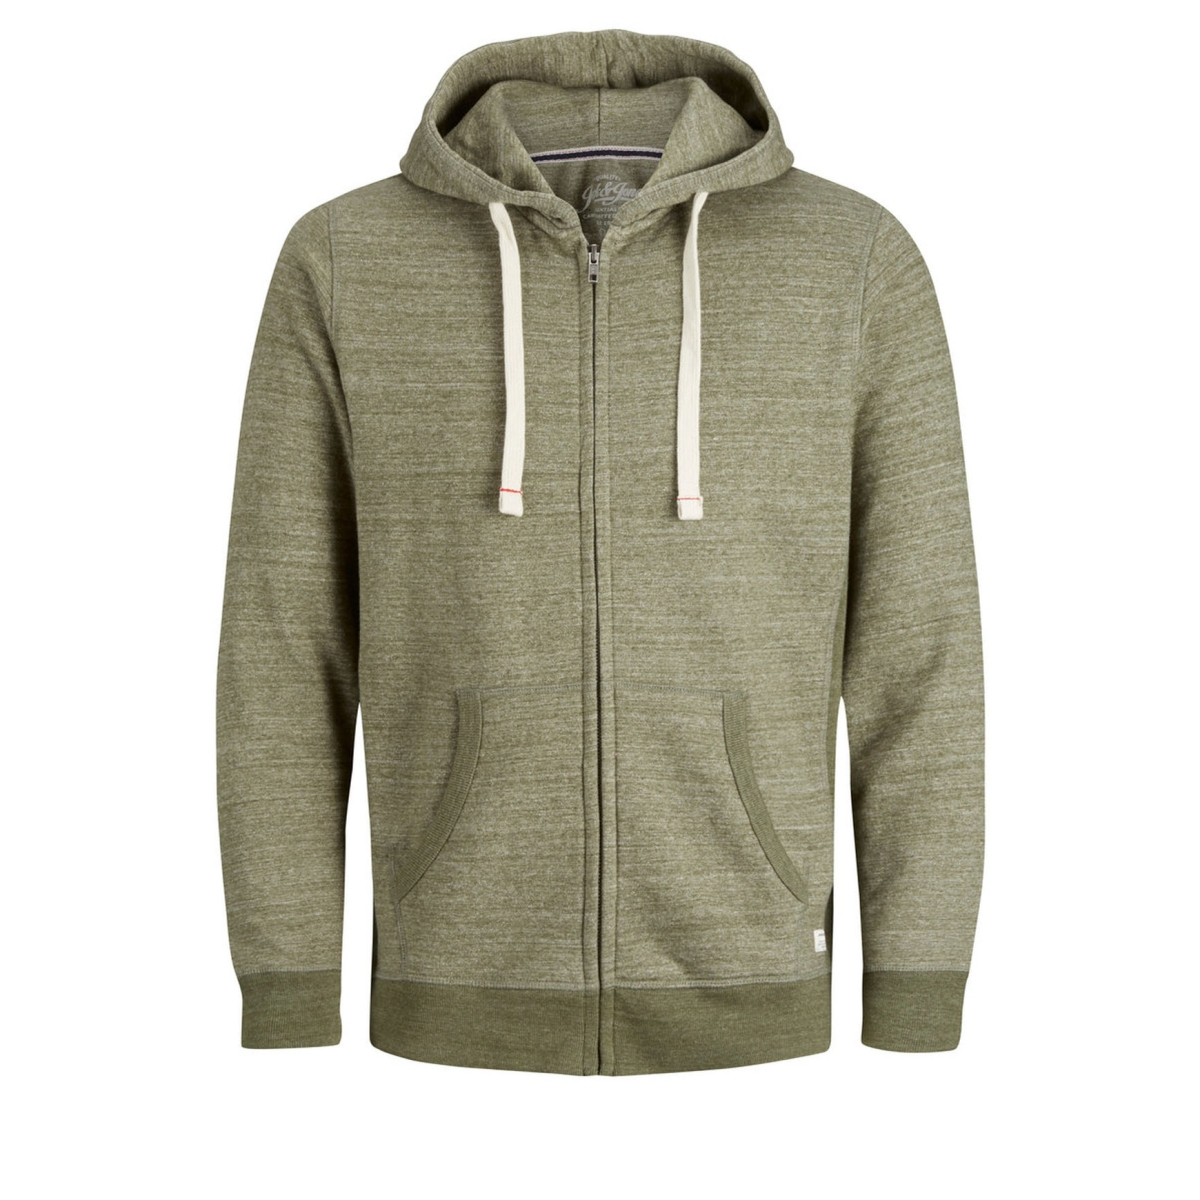 jjespace melange sweat zip hood noos 12136769 jack & jones vest olive night/reg fit